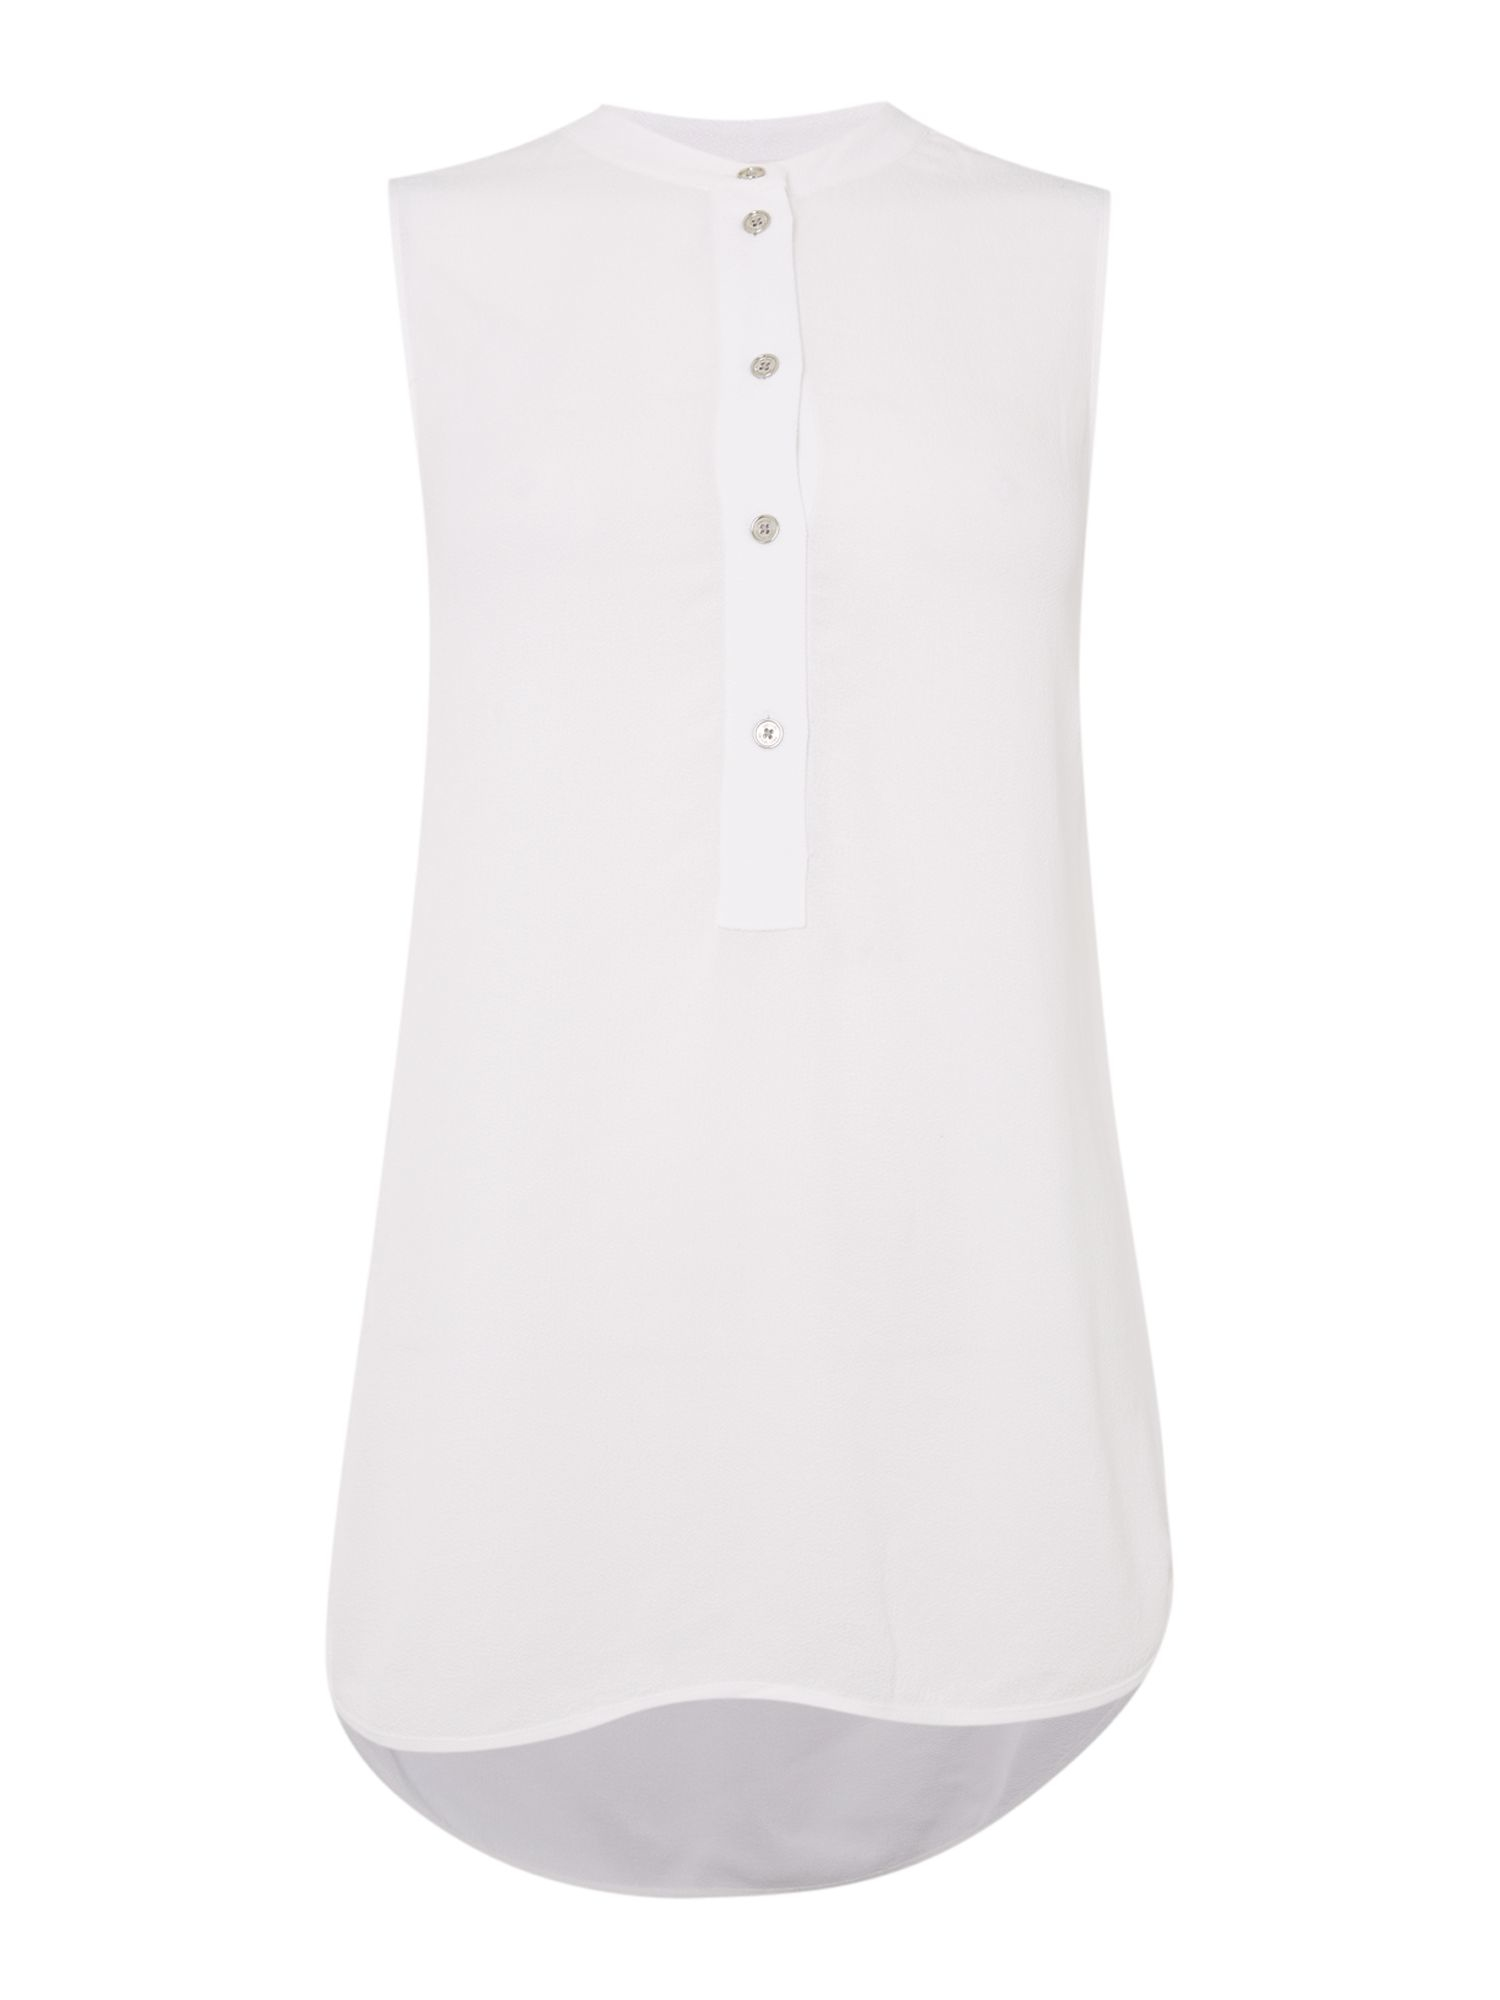 Michael Kors Sleeveless Button Up Shirt In White Lyst